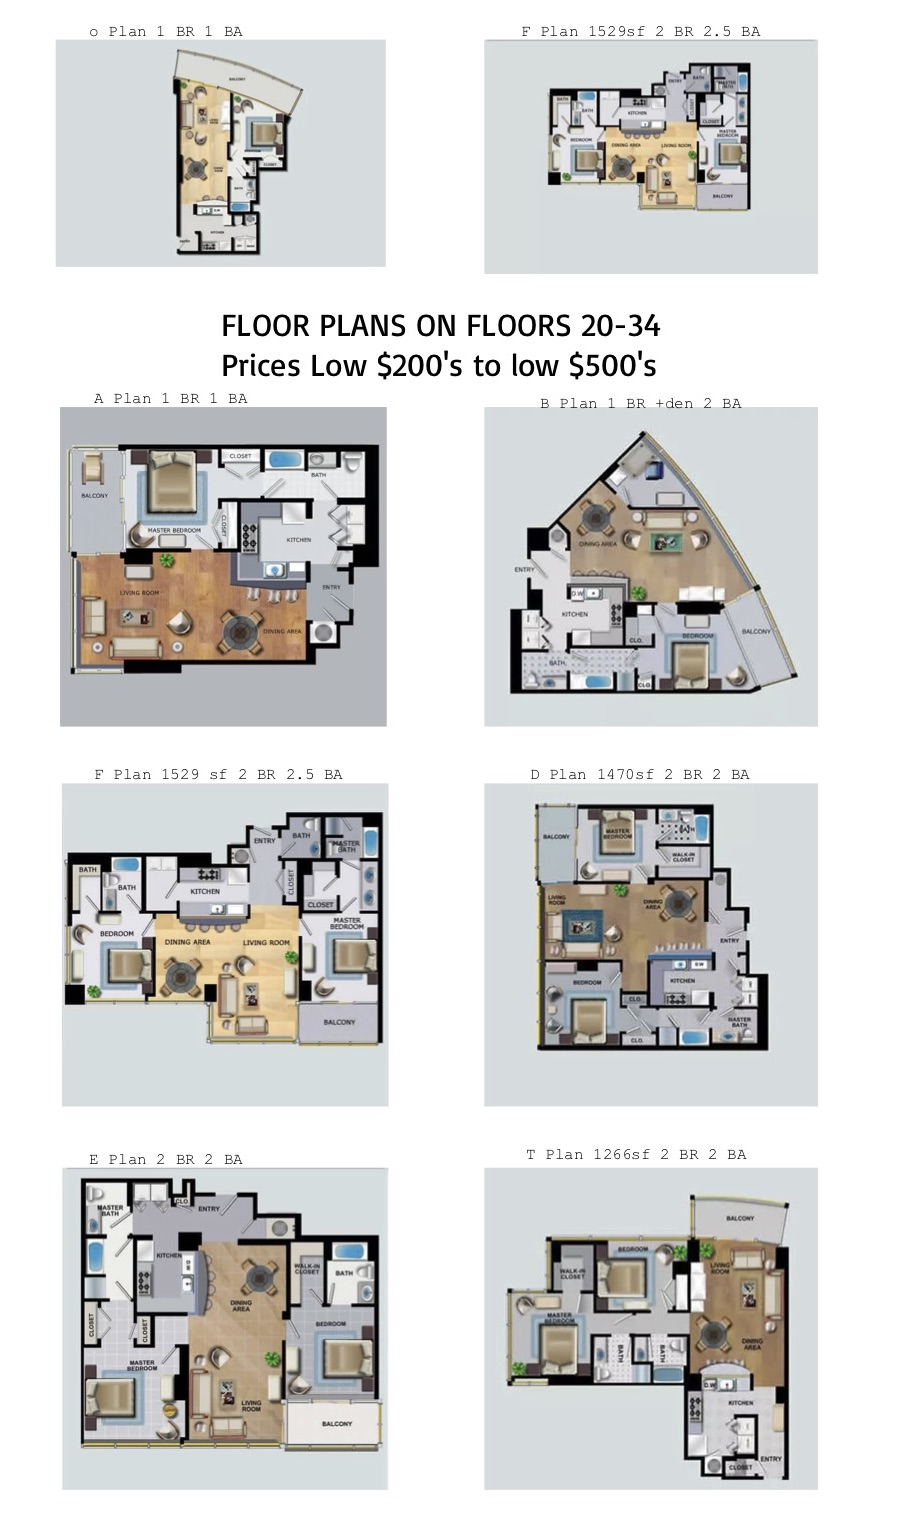 buckheadgrand _ Floor Plans2.jpg